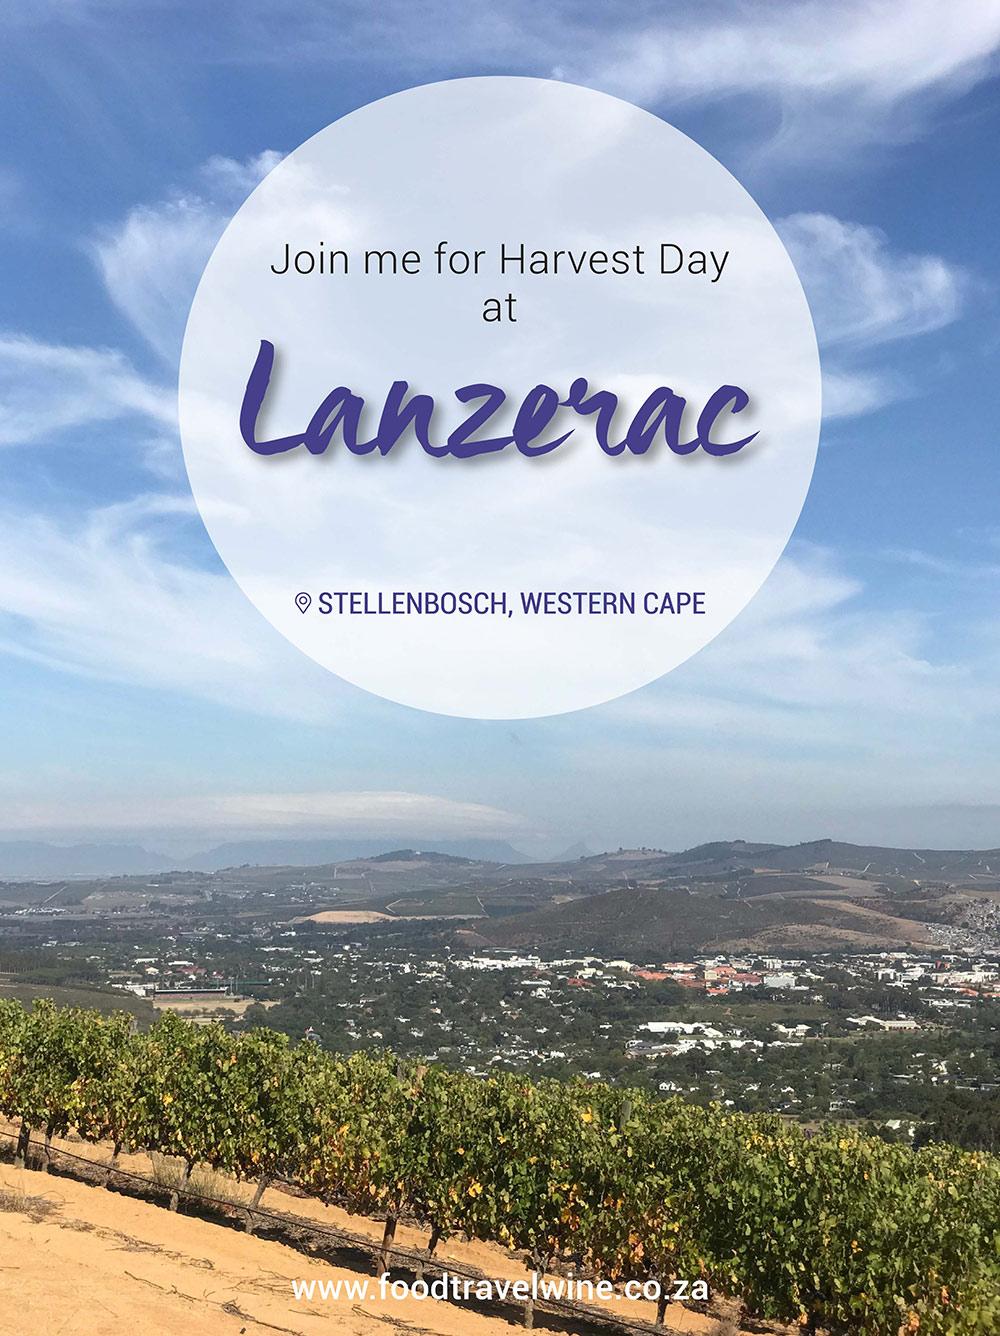 Lanzerac Harvest Day